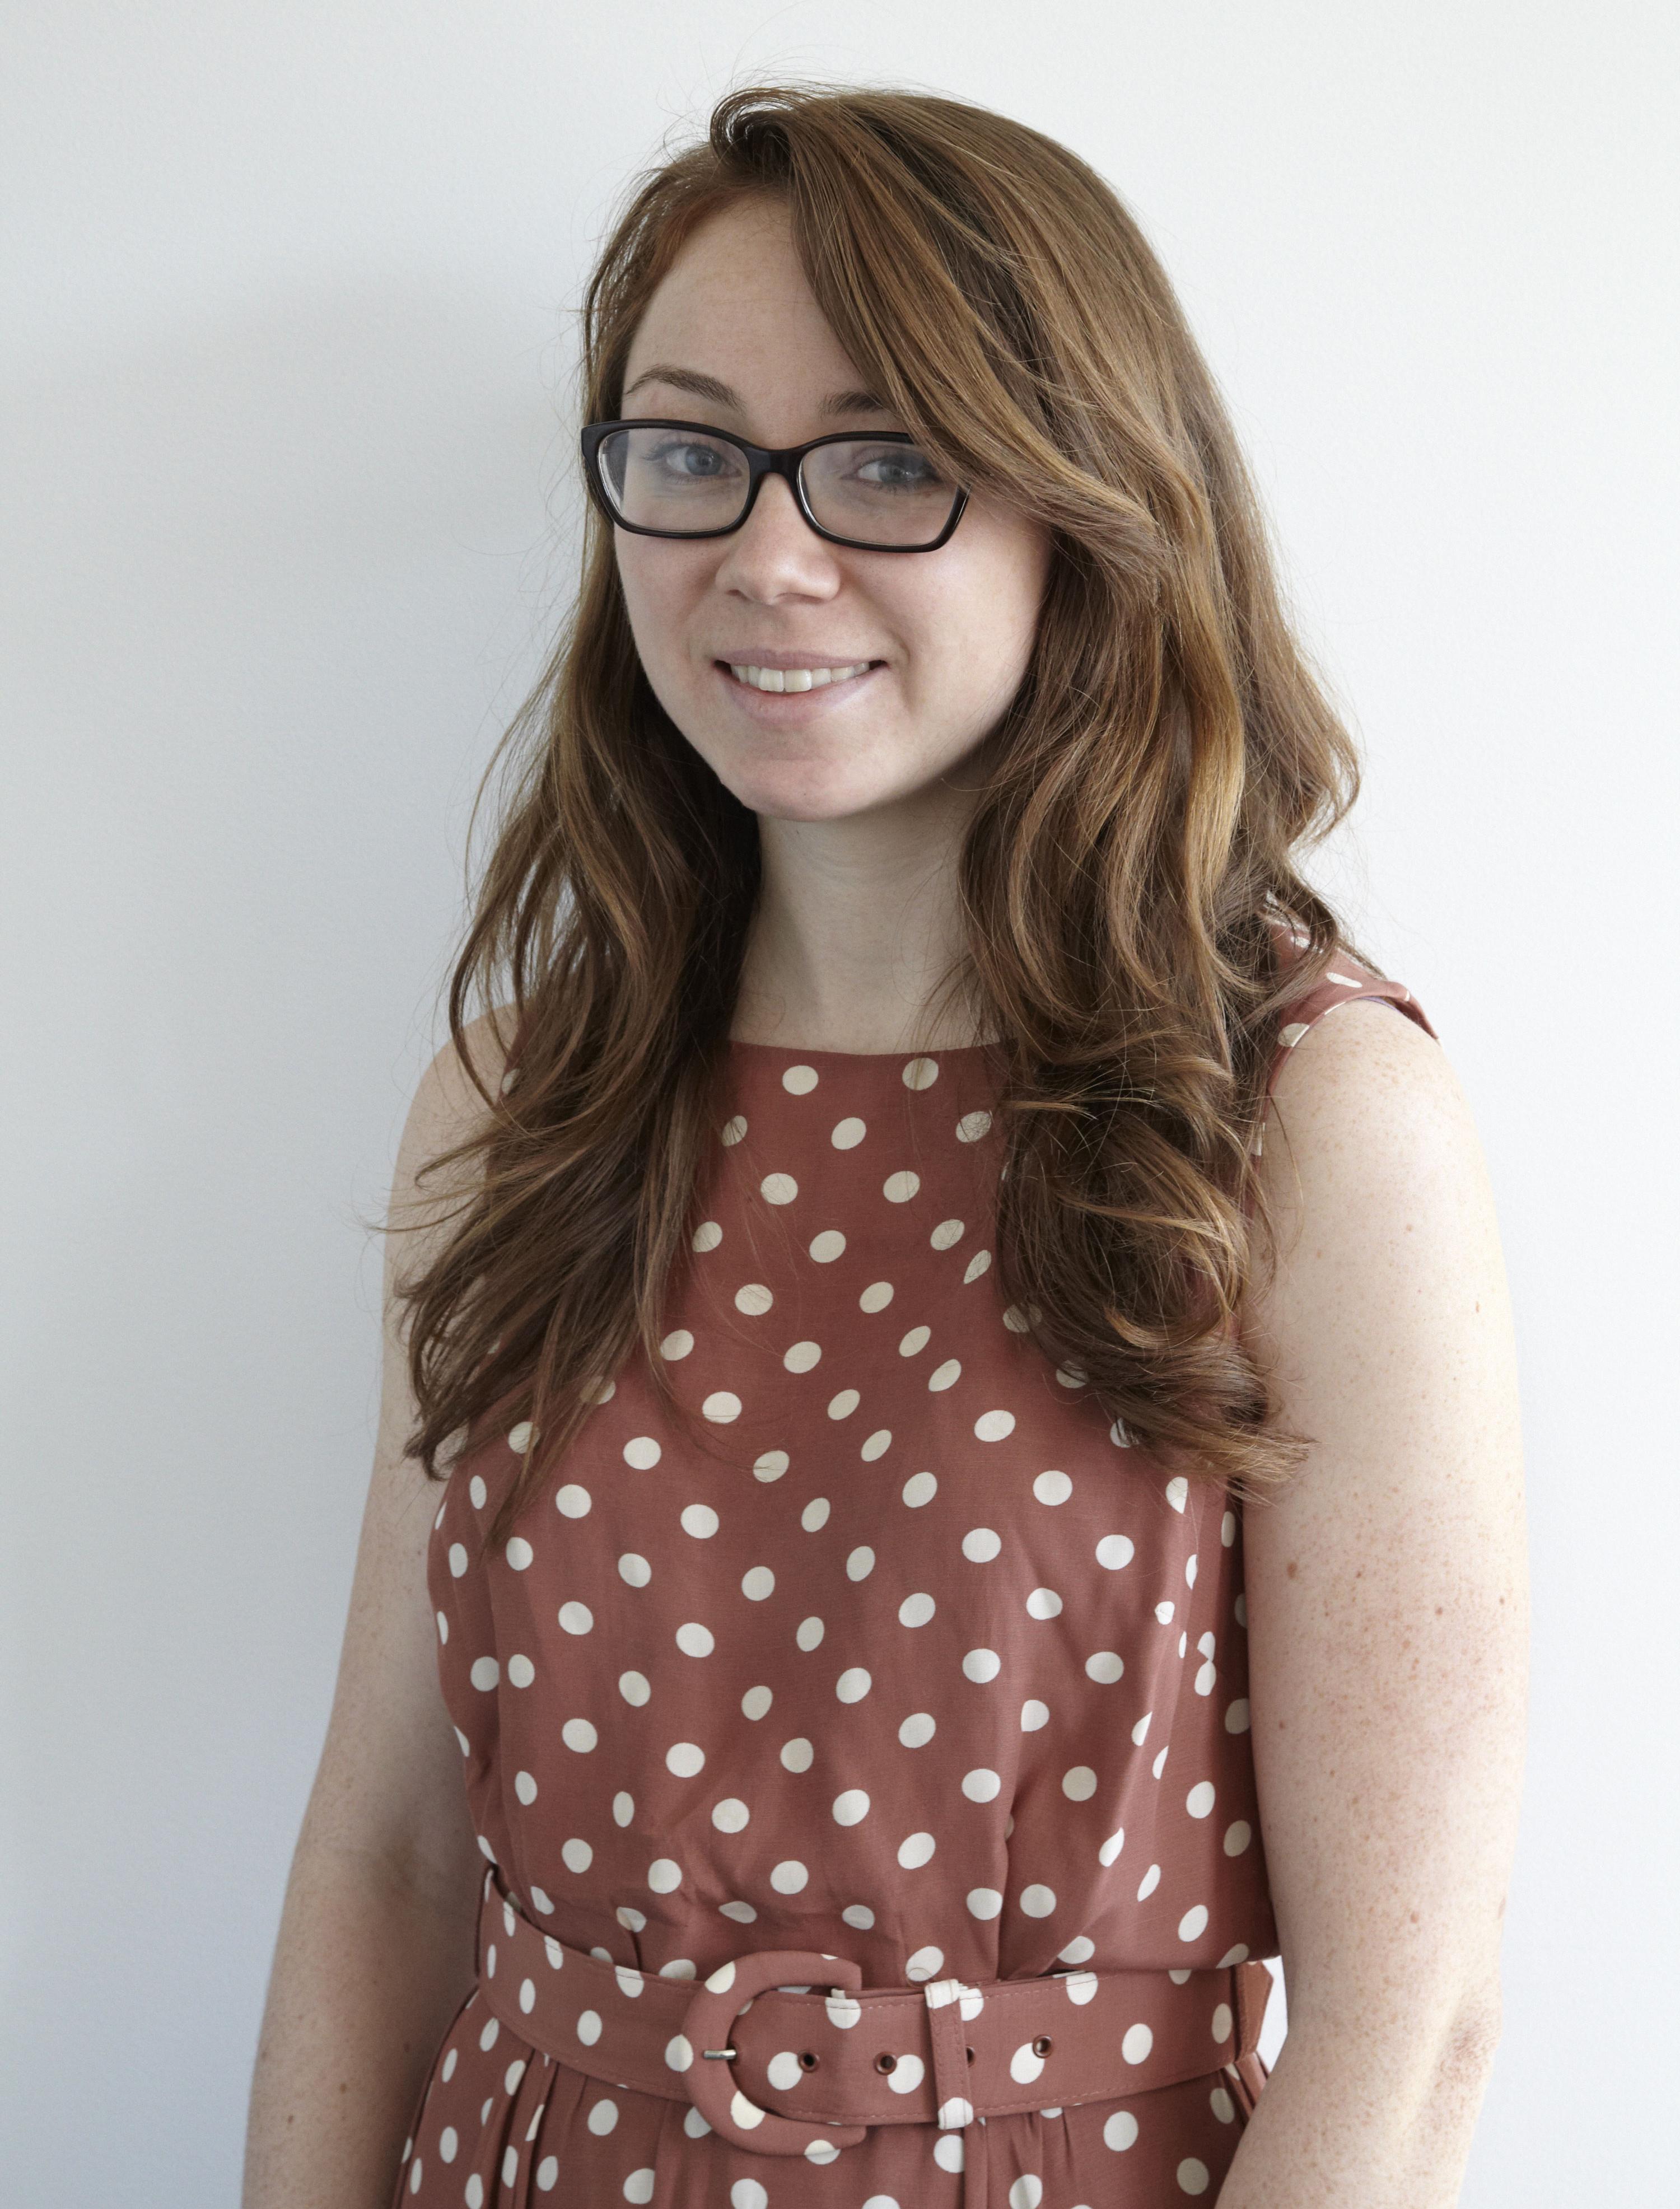 Megan Gannon